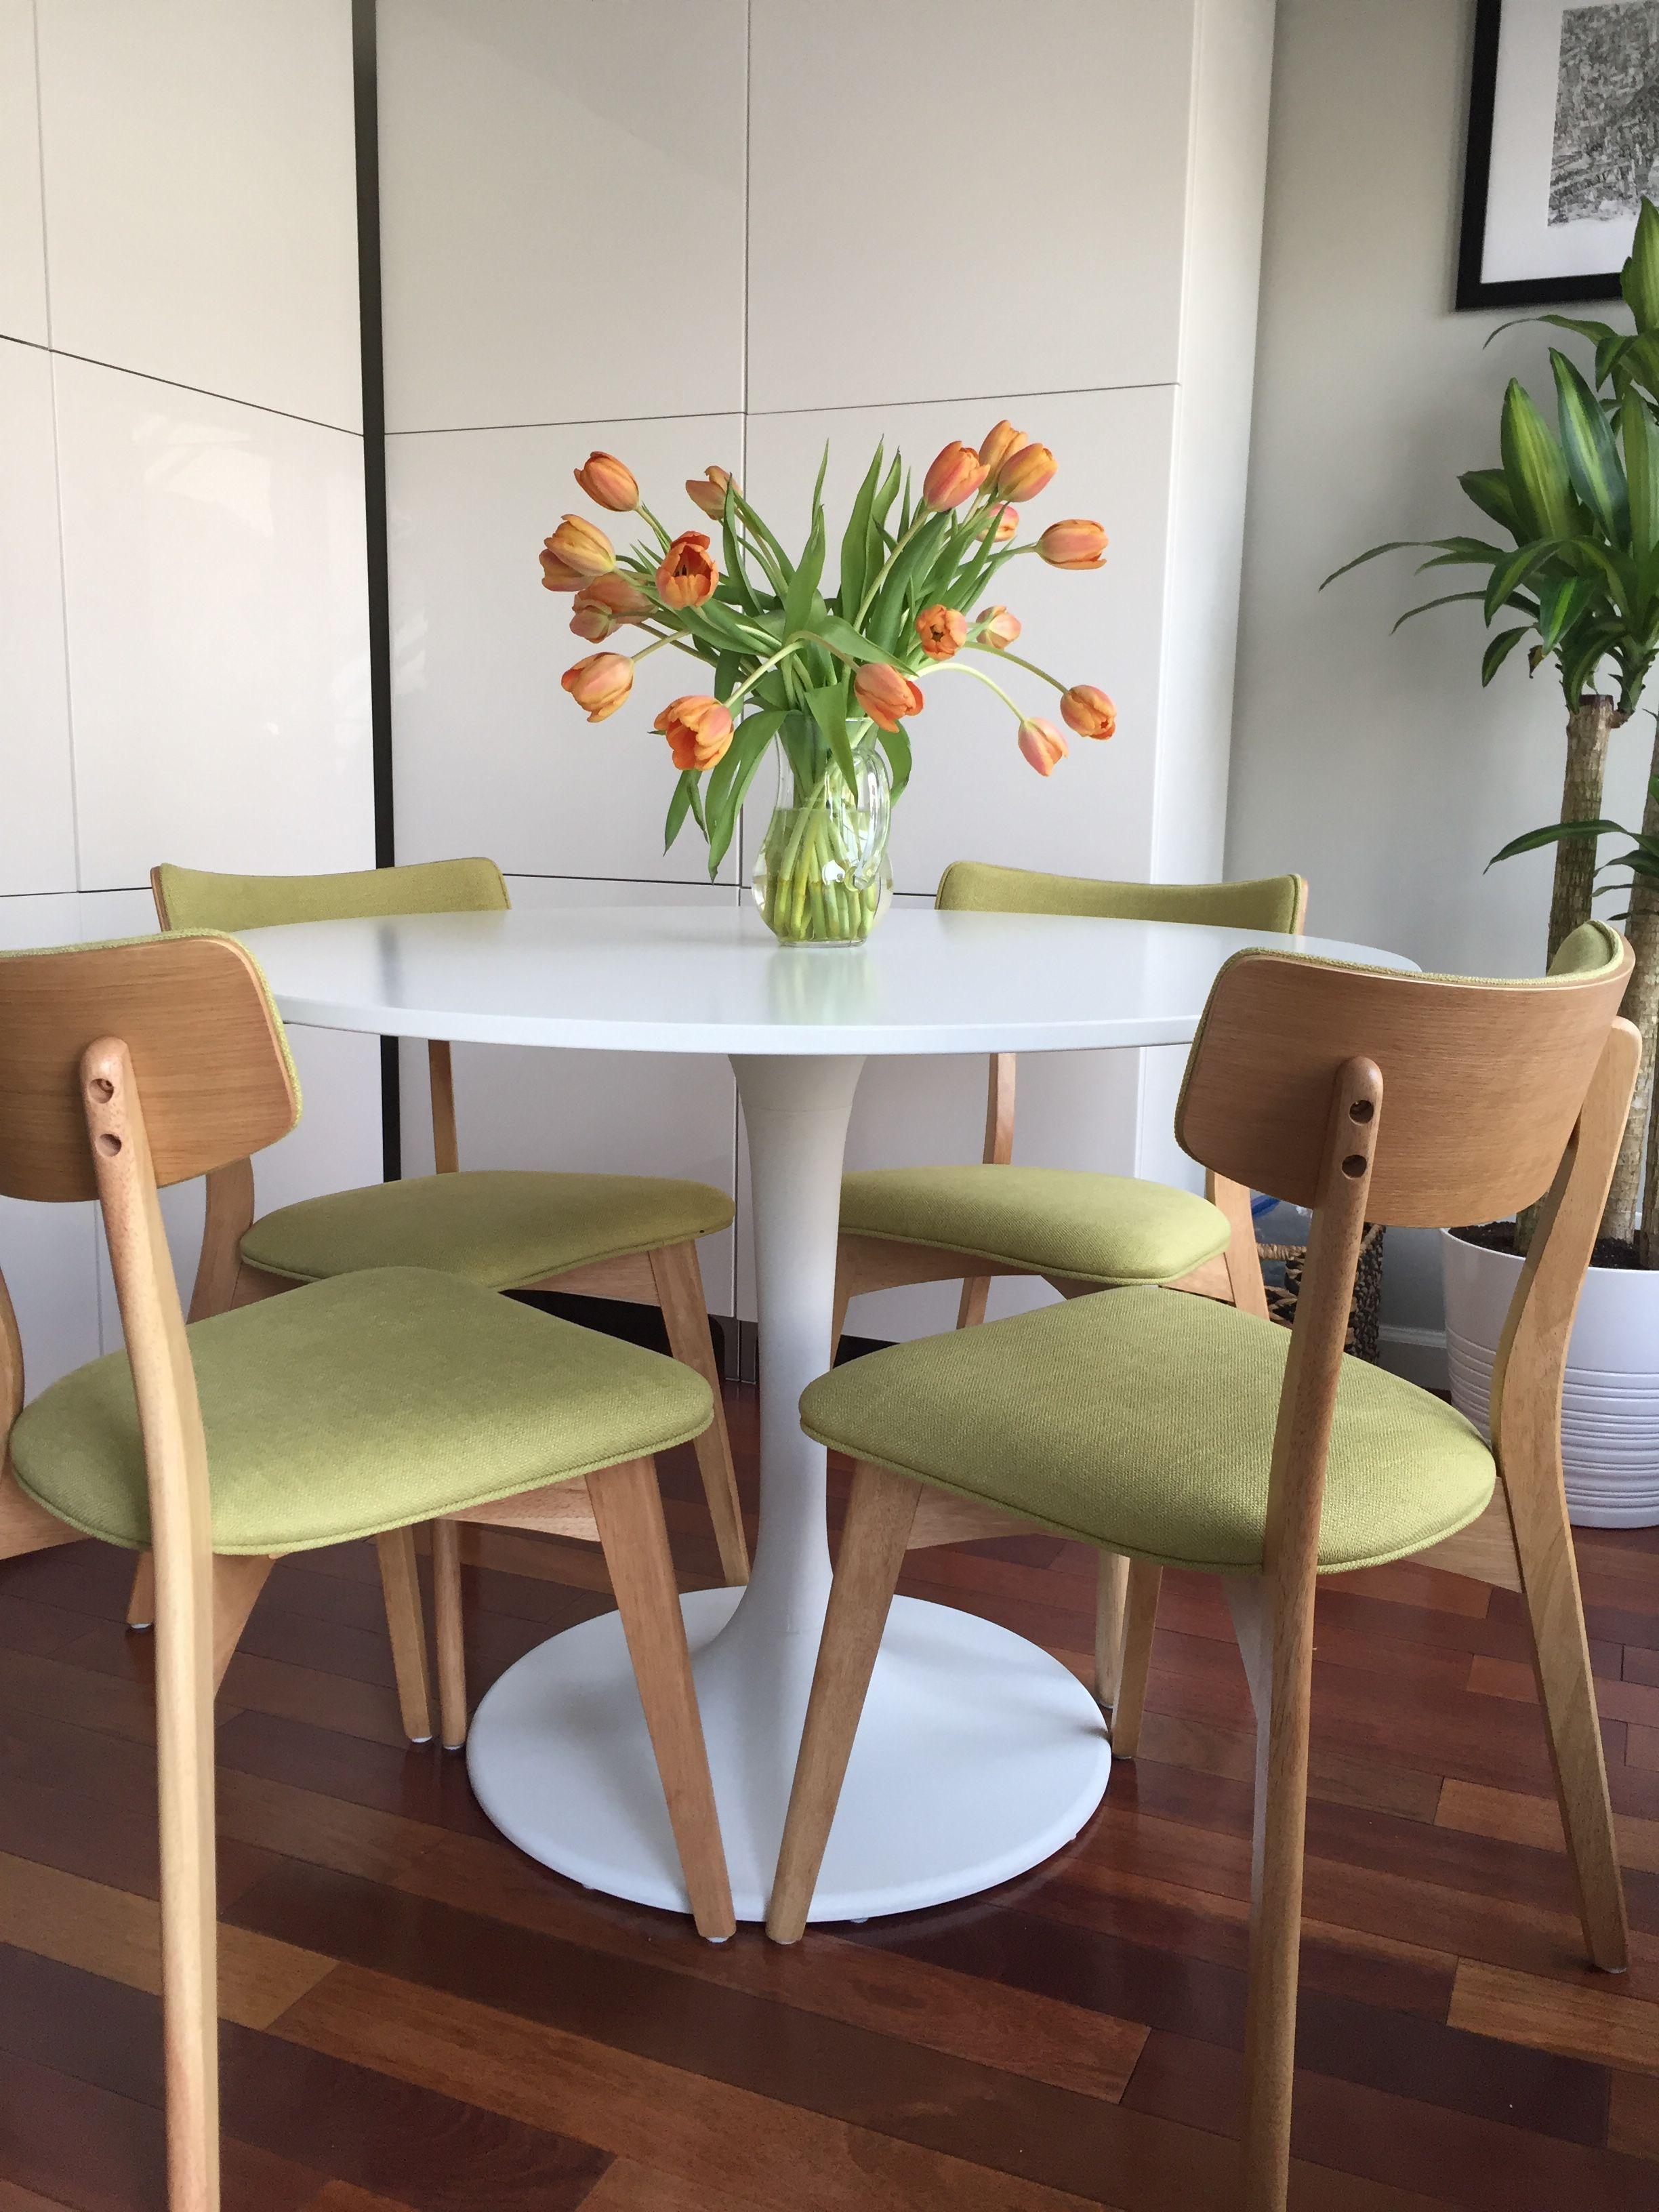 My Kitchen Cabinets Besta Ikea Table Docksta Ikea Chairs